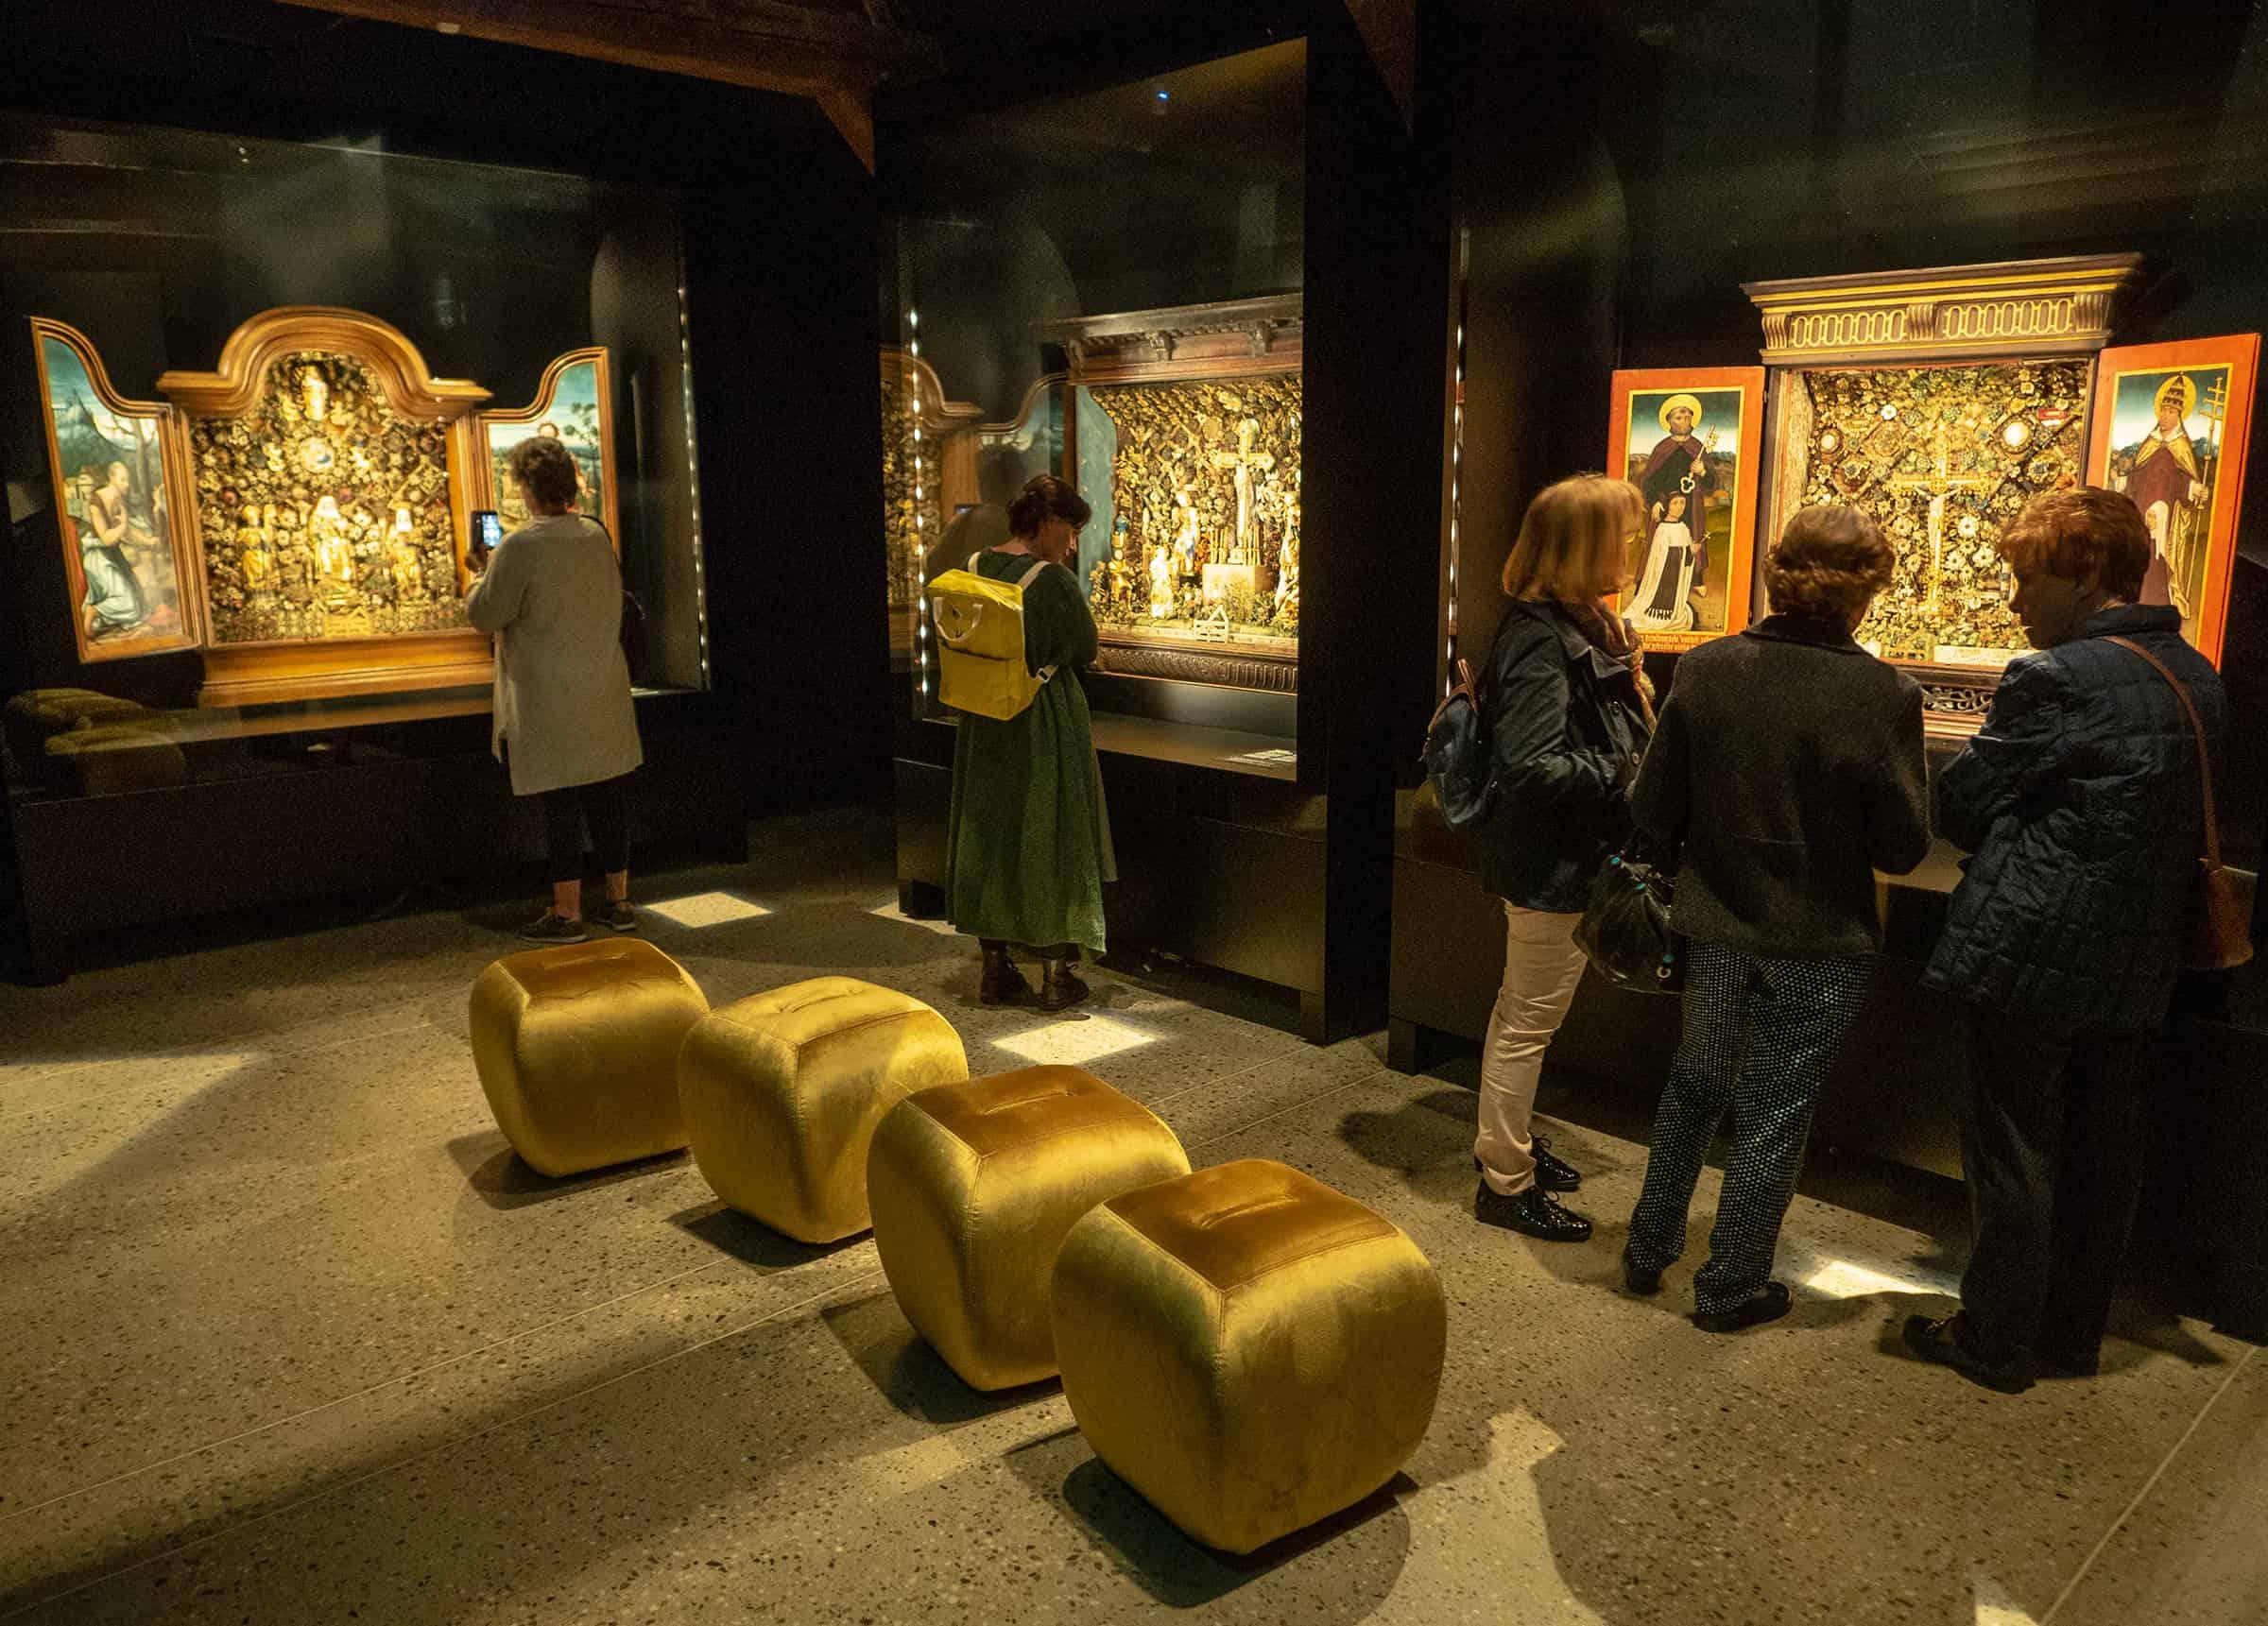 Museum Hof van Busleyden